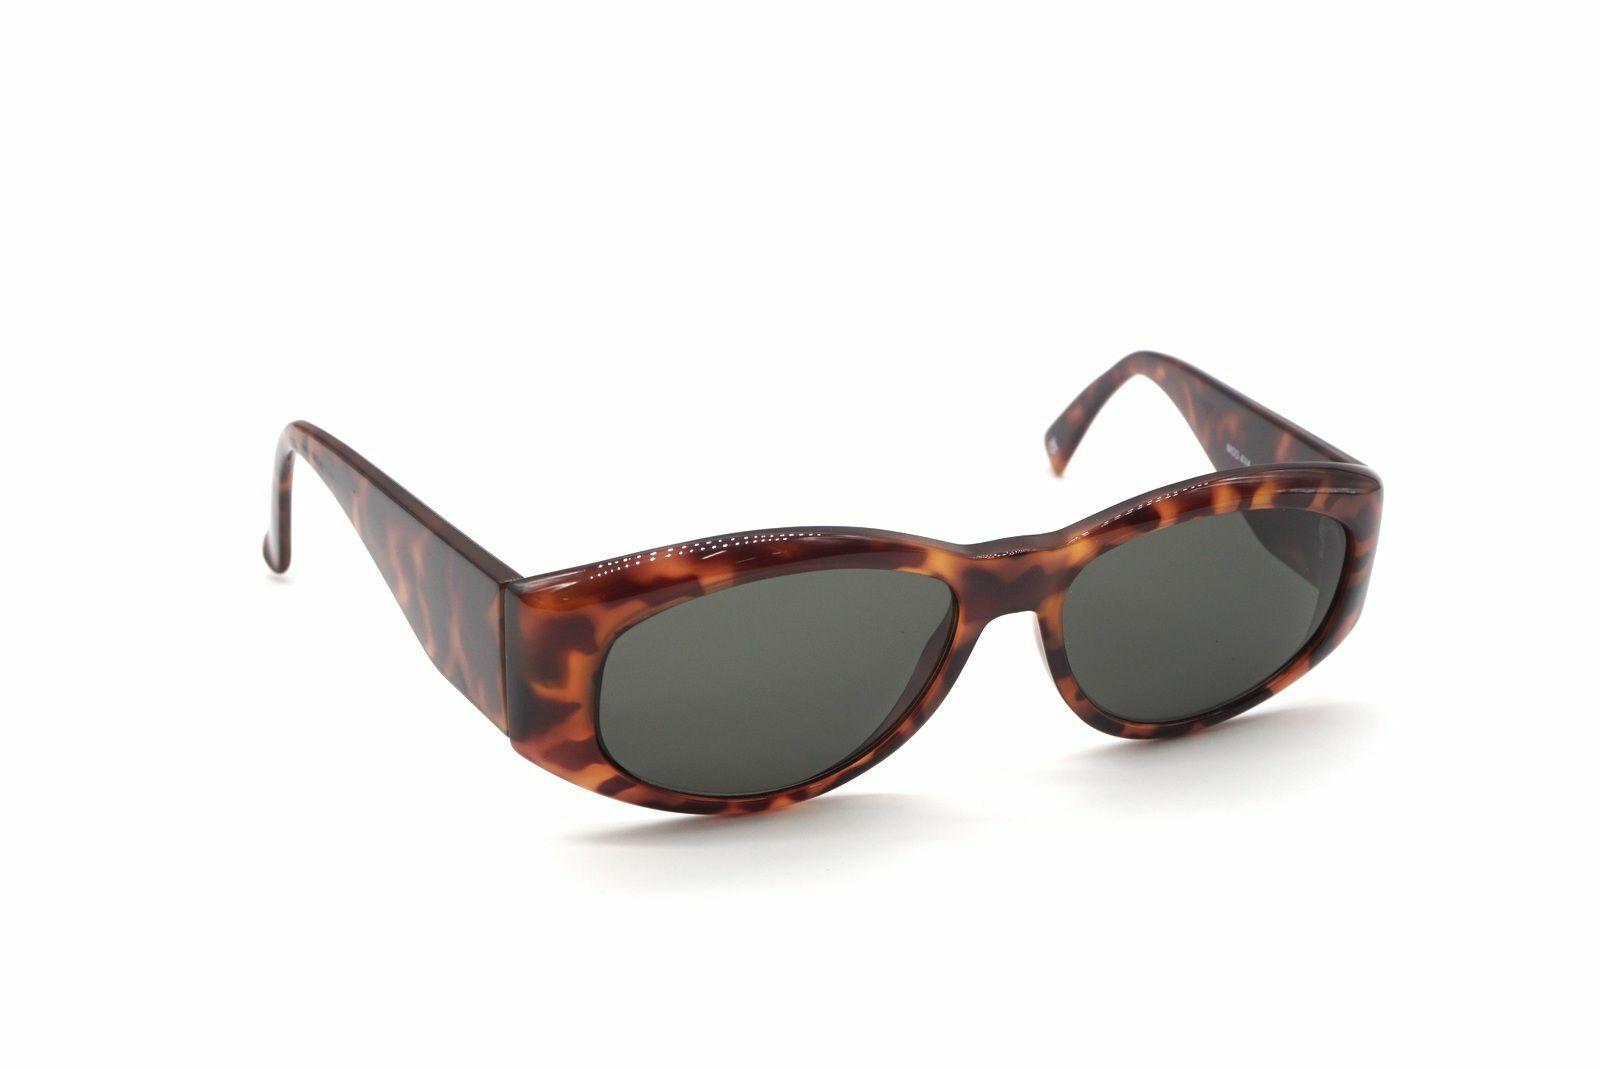 GIANNI VERSACE Medusa Sunglasses Eyewear Tortoiseshell pattern Brown 5134k